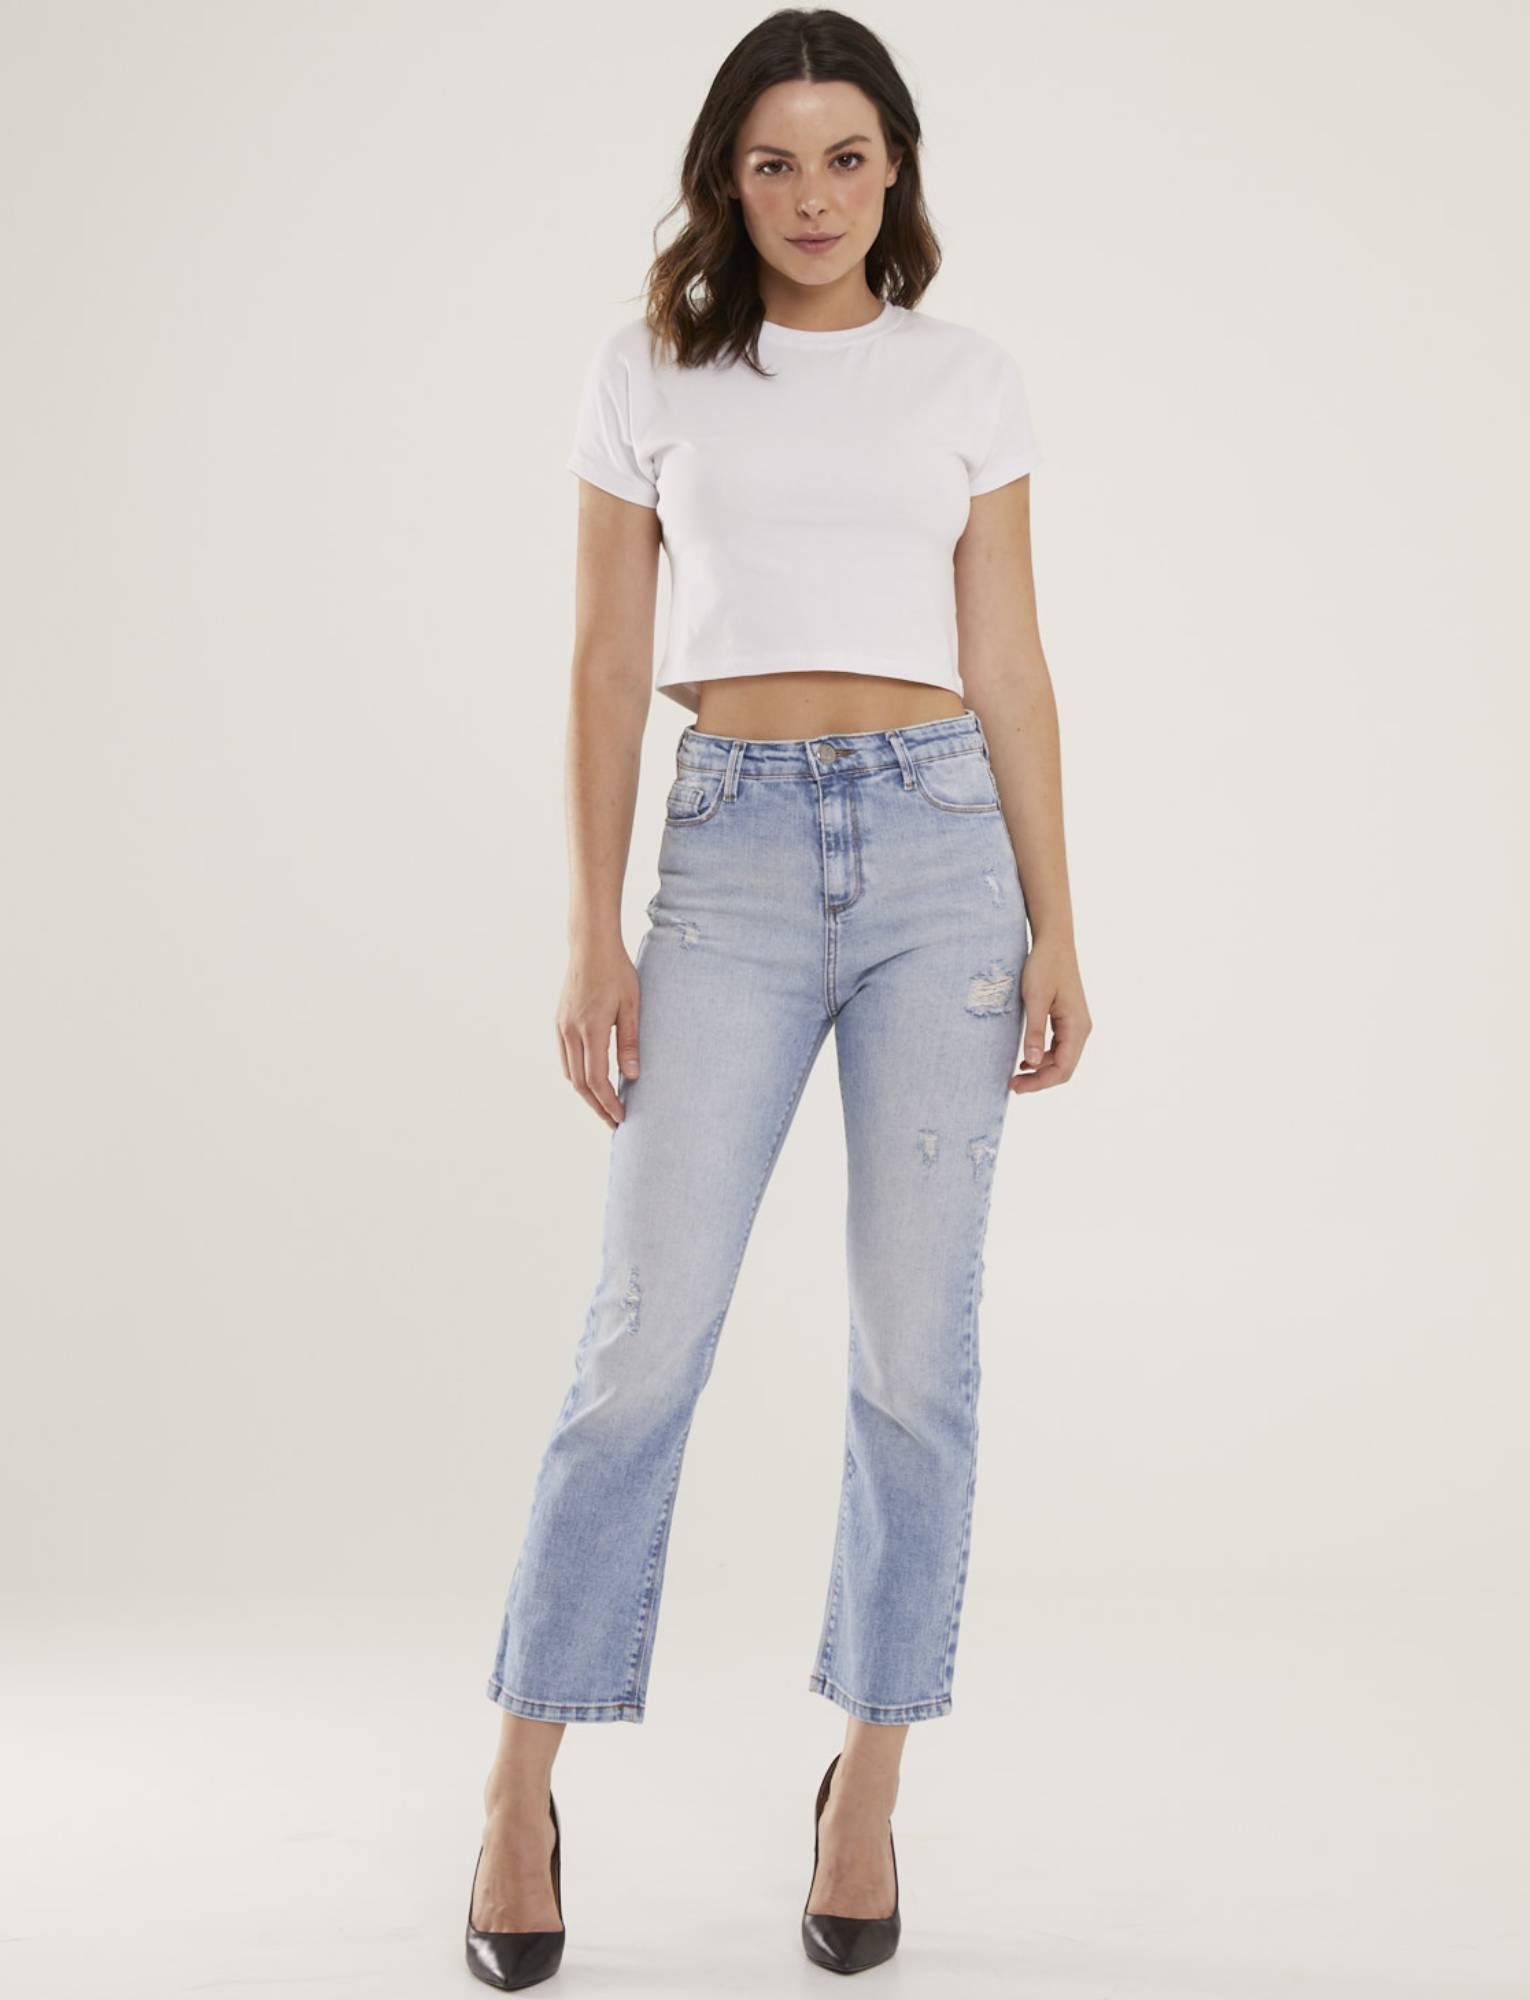 Calça Jeans Feminina Destroyed Reta Lili